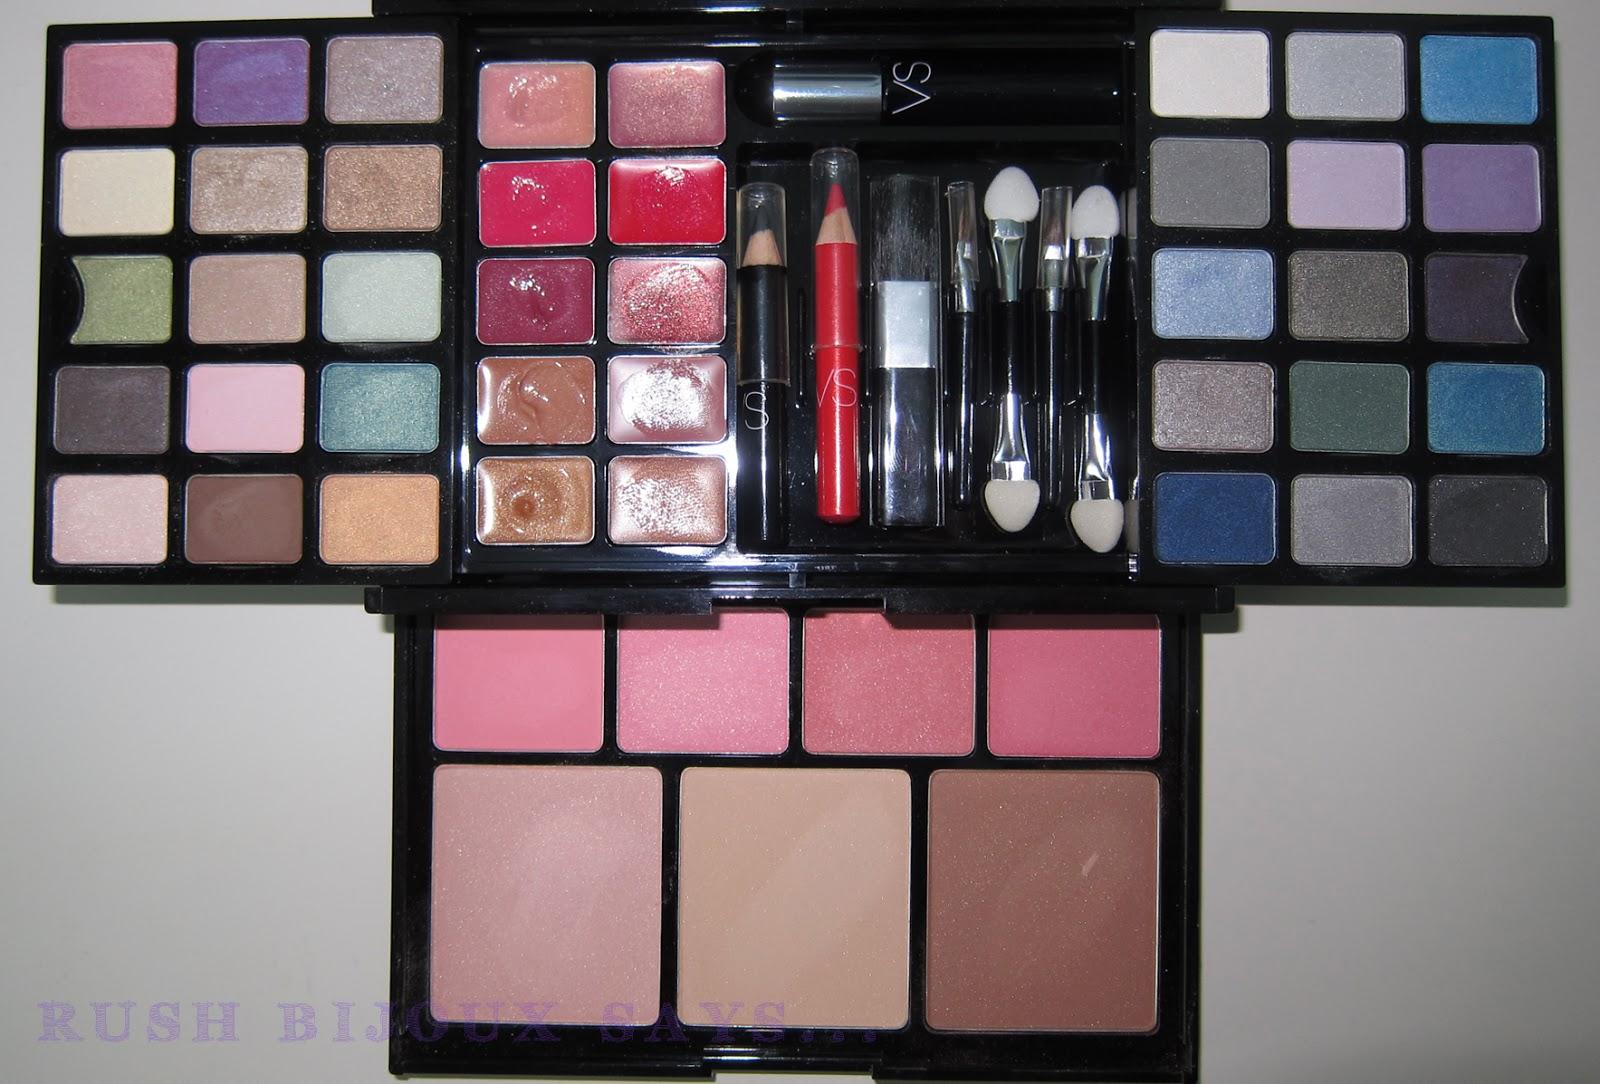 Rush Bijoux Says Victorias Secret Ultimate Makeup Kit Swatch